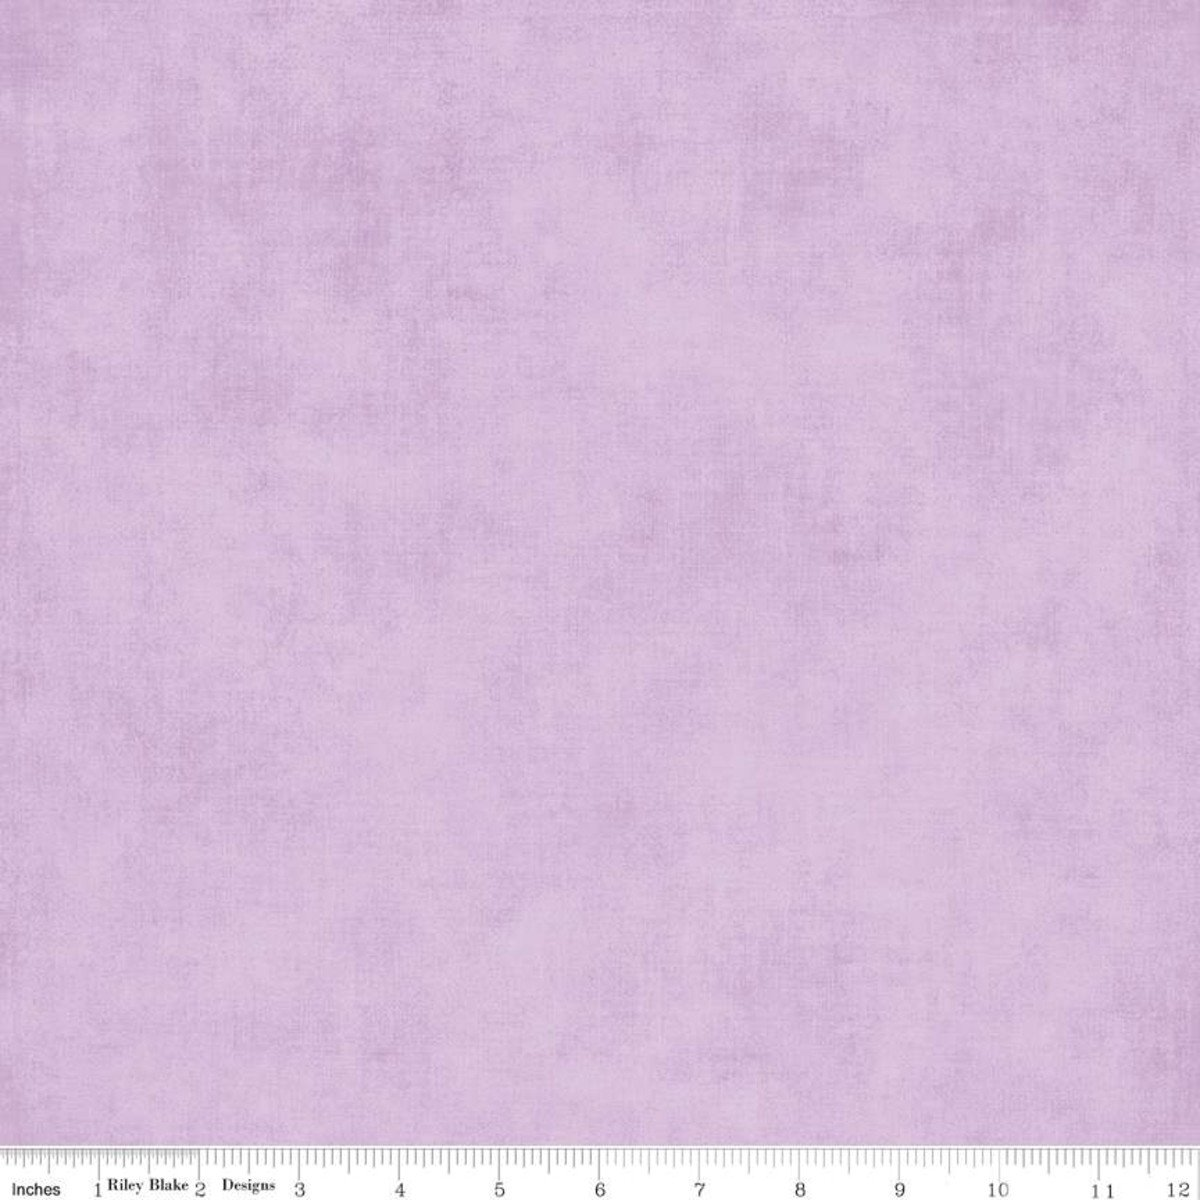 Riley Blake Designs, Shades - Lavender